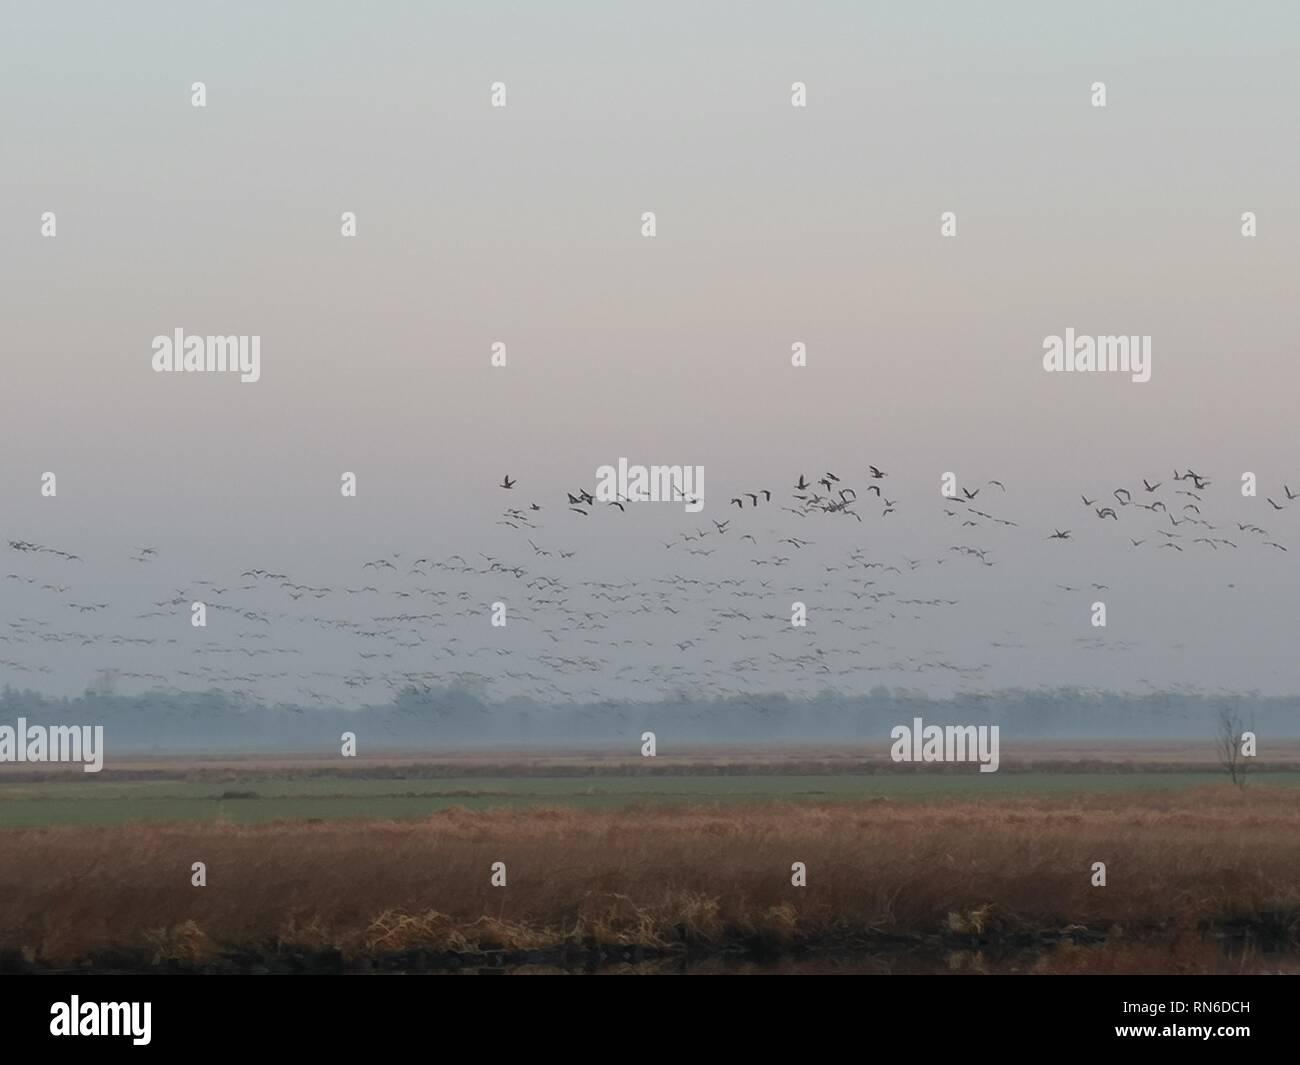 Wildvögel im Morgennebel, Landschaft, Morgengrau Stock Photo